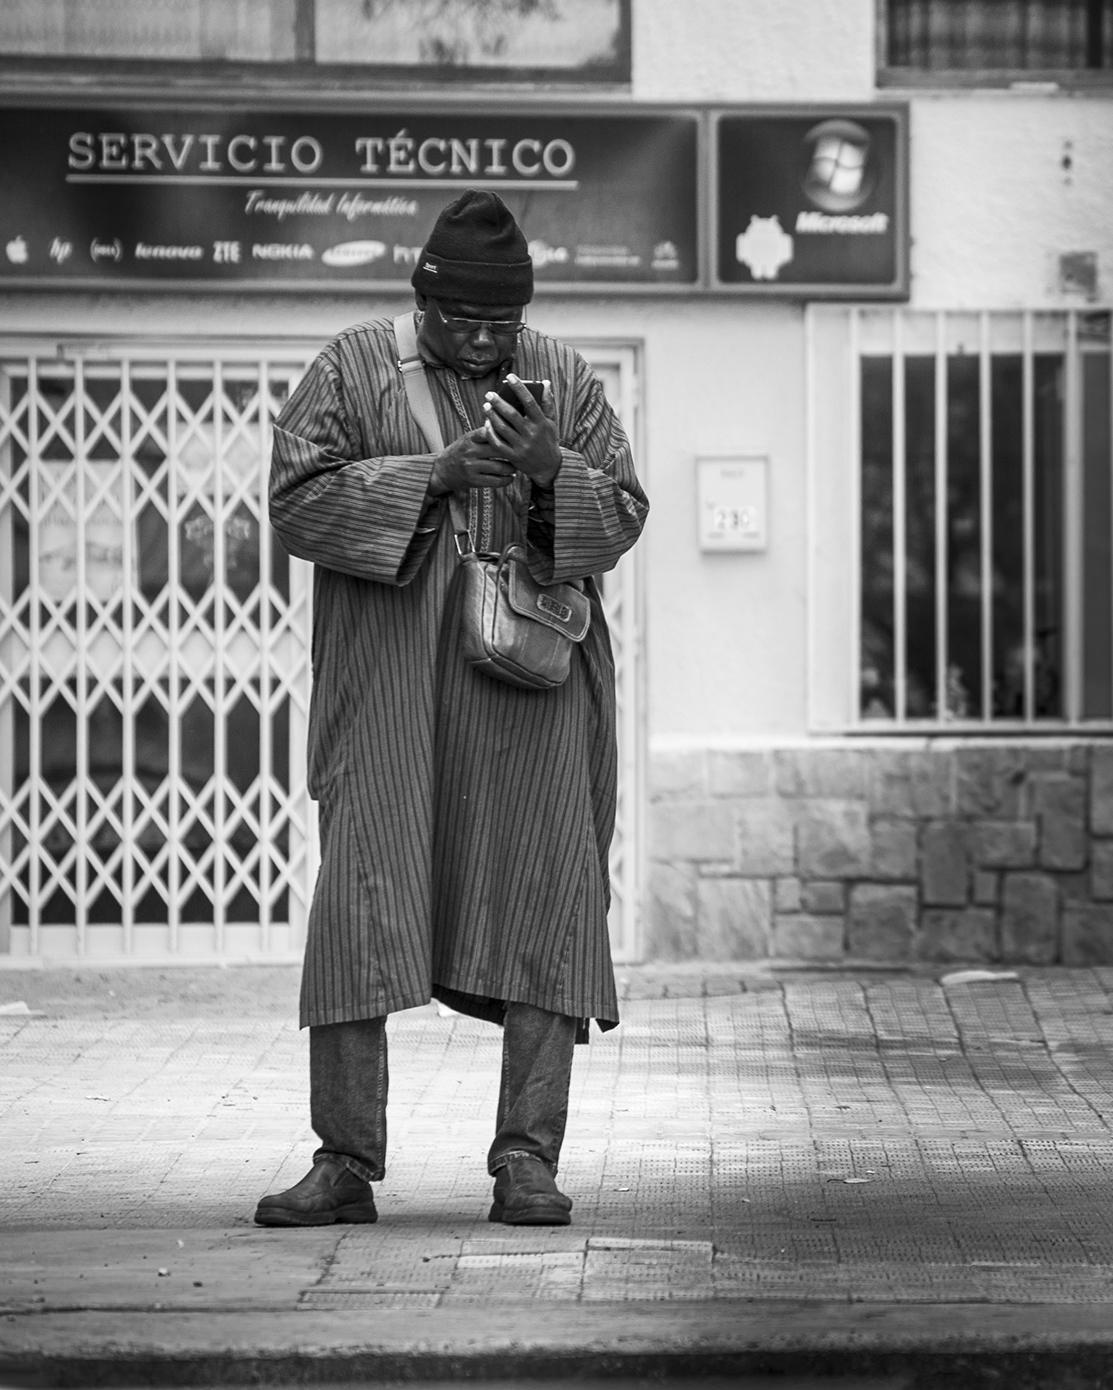 La Cañada-Valencia 2019 (E) - Street-b&w - Urbano Suárez,  FineArt Photography